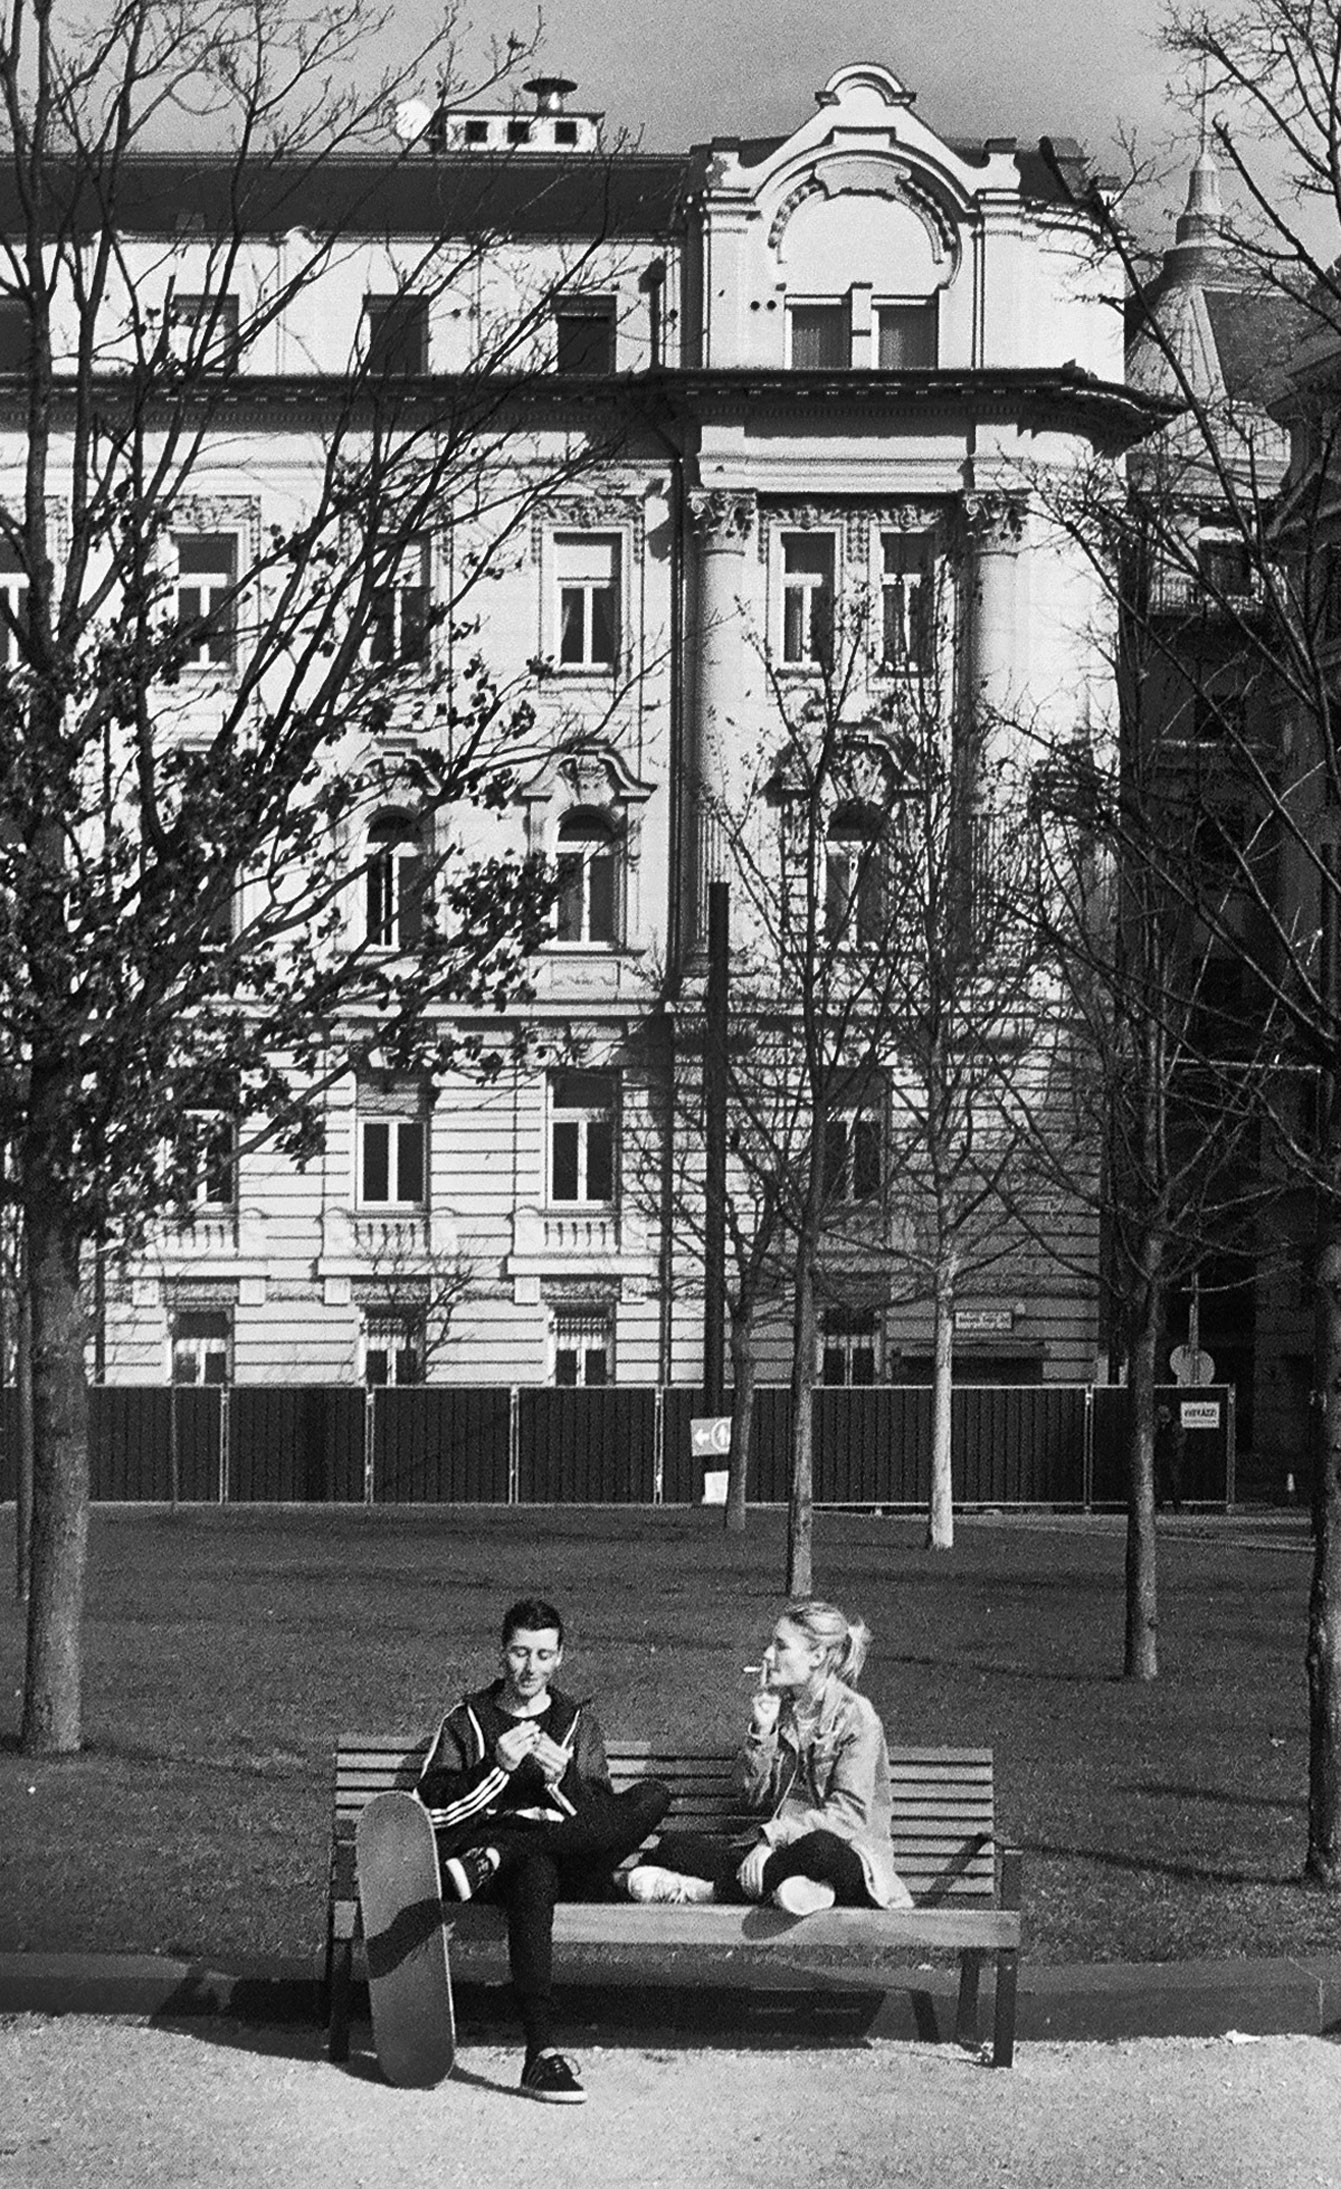 alex-laniosz-film-europe-smoke-bench.jpg